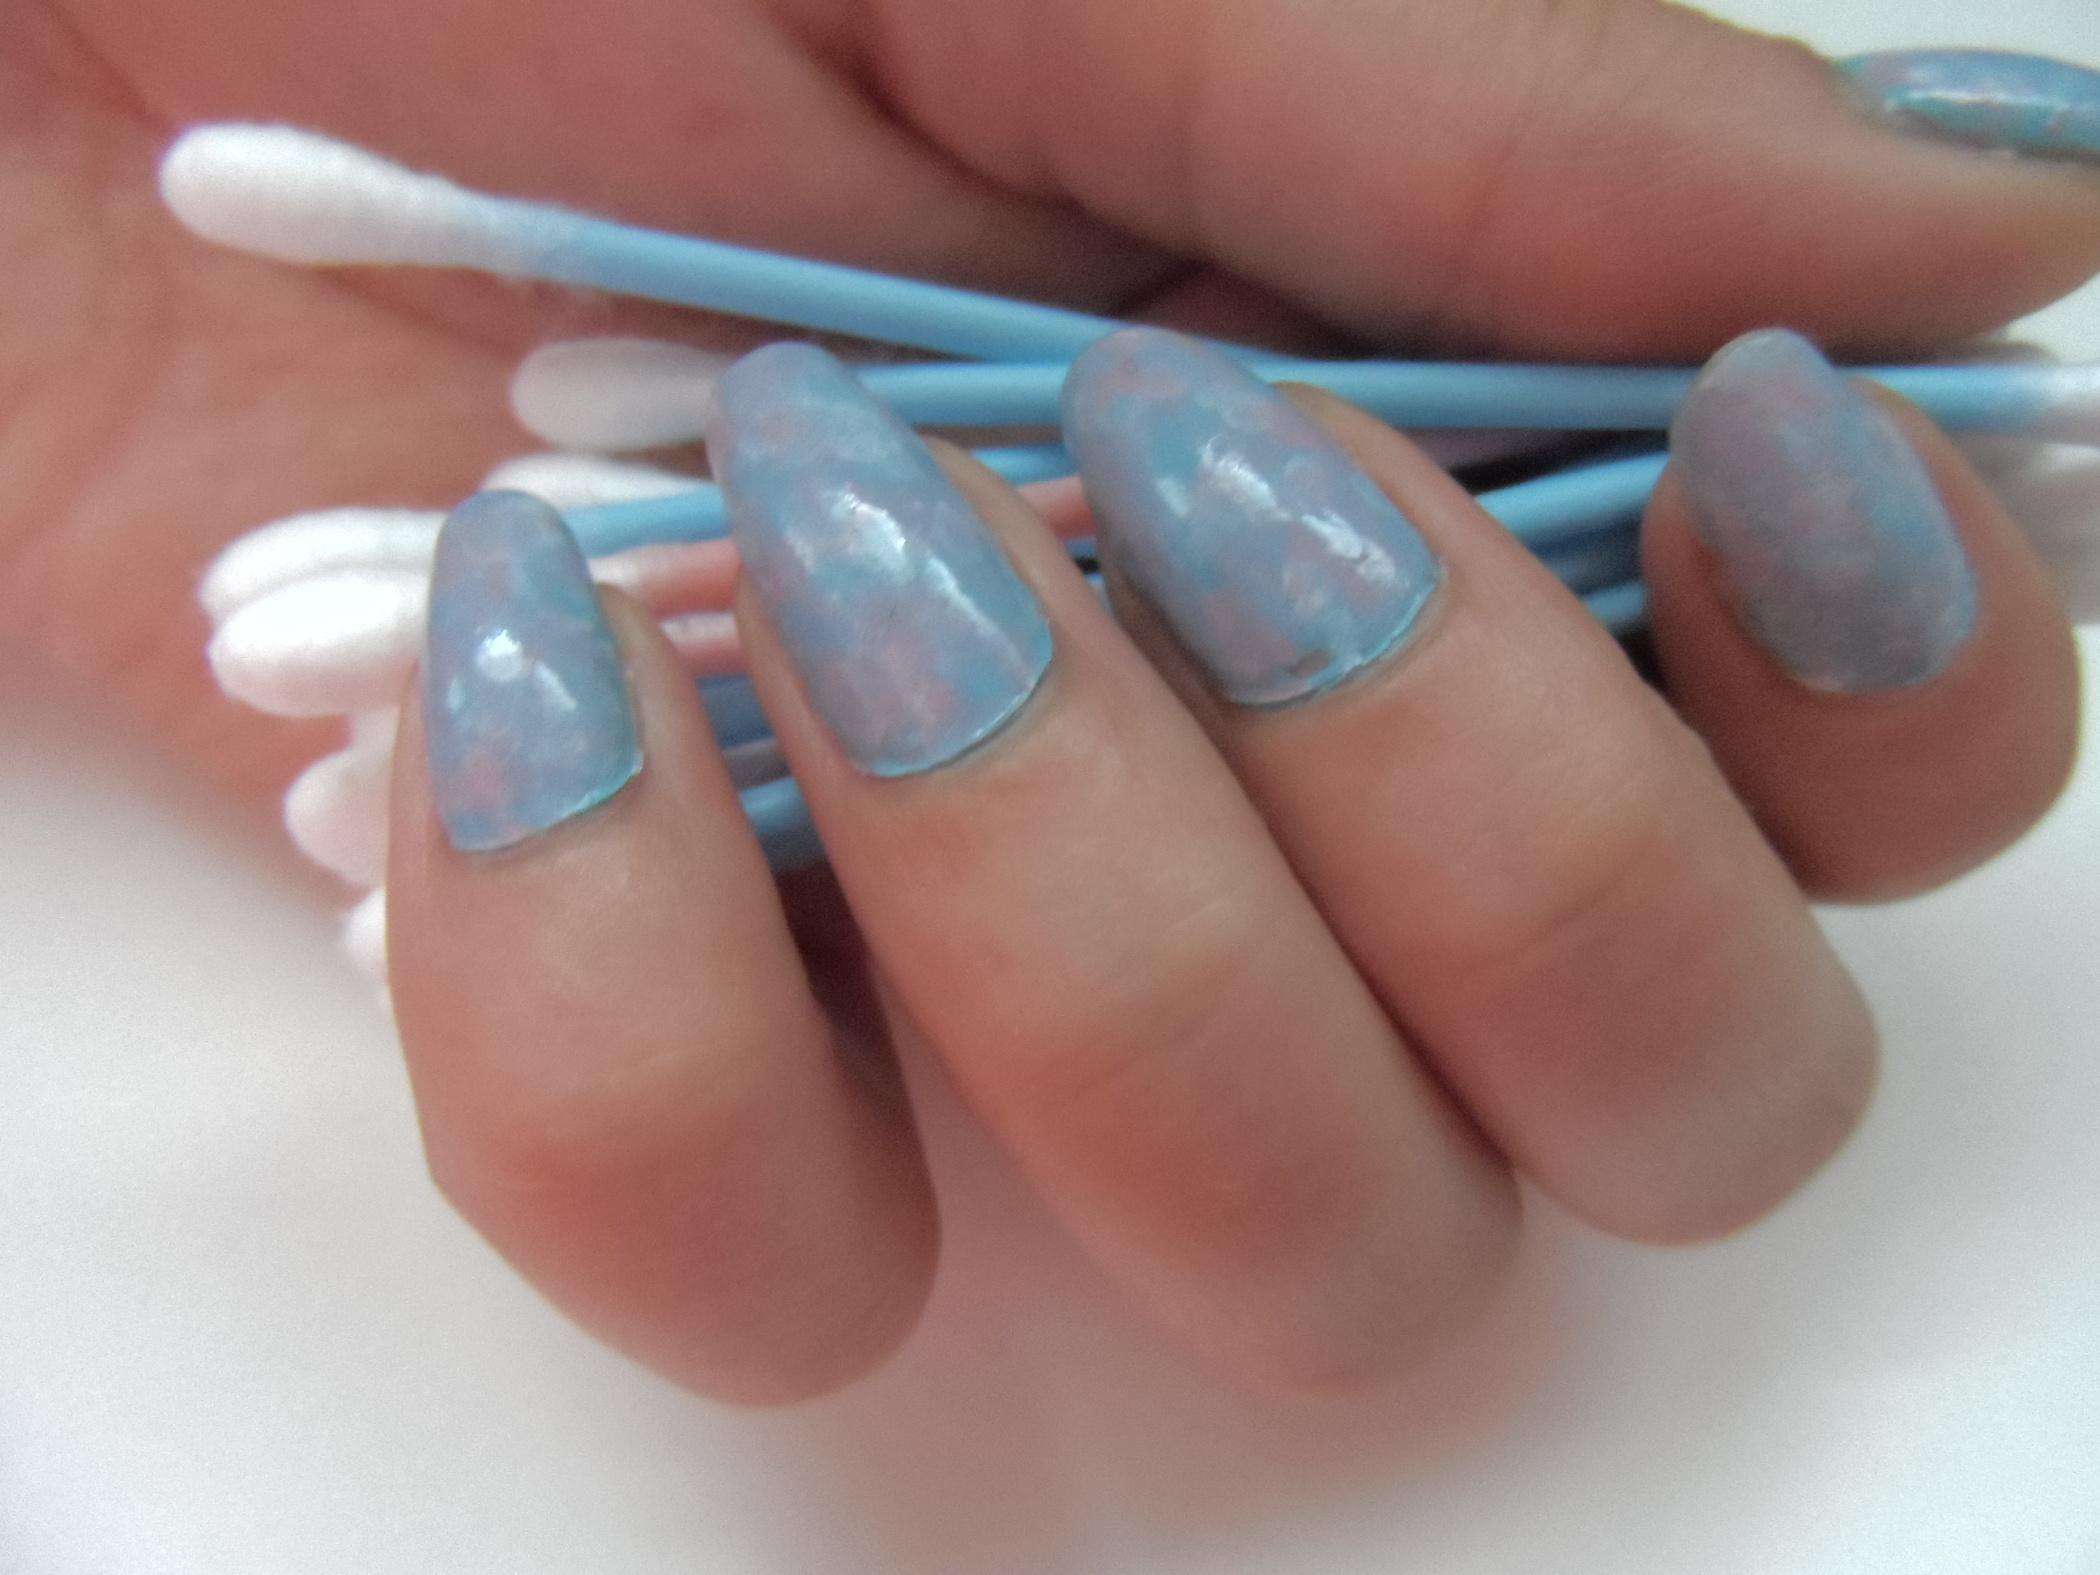 ob_0fa313_nail-art-coton-tige-materiel-1